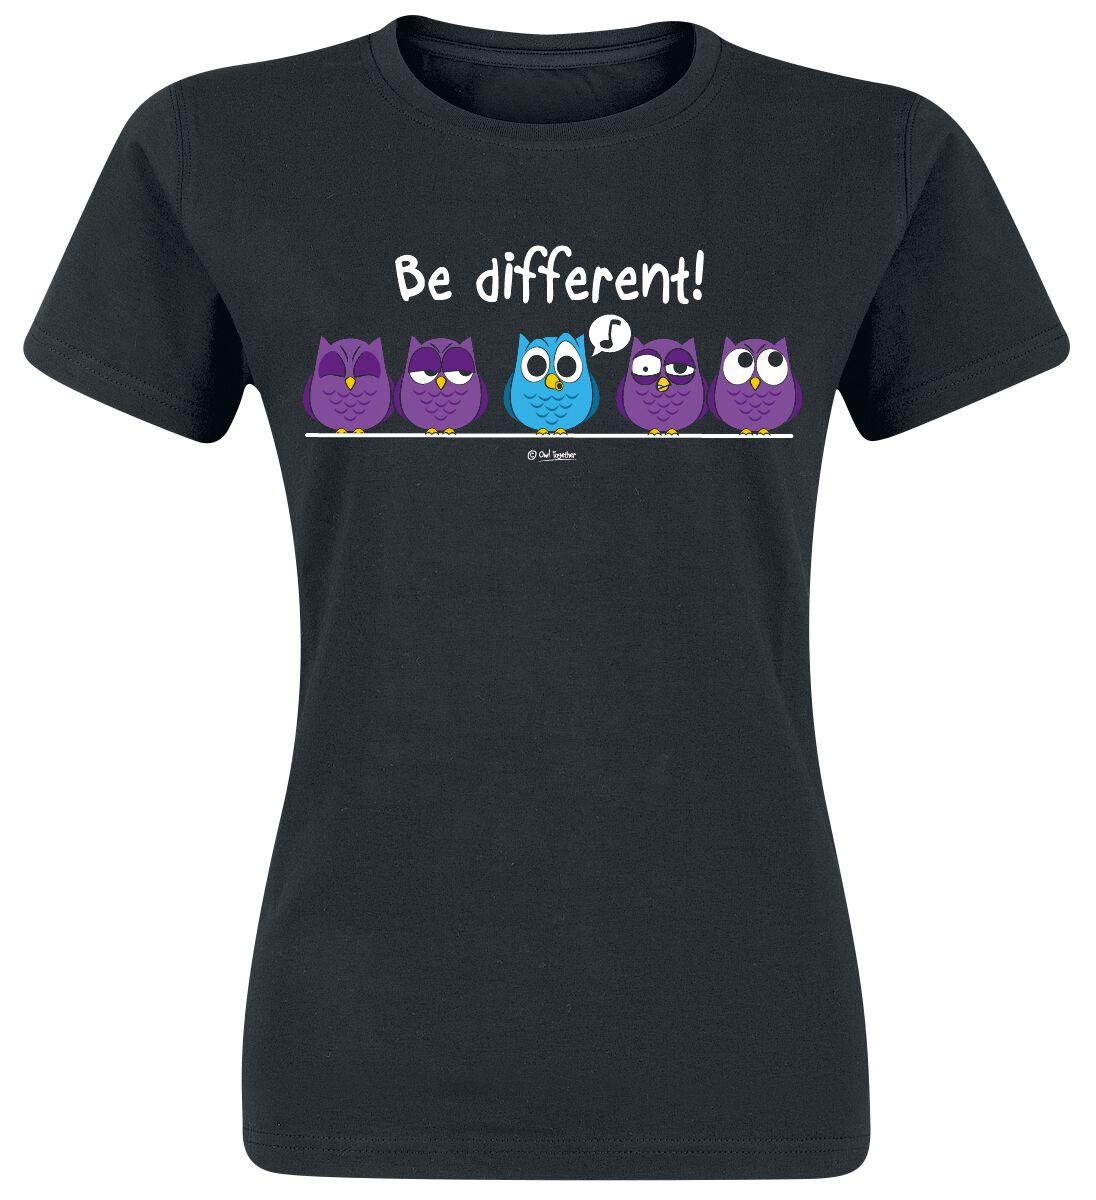 Tierische Sprüche Be Different! Koszulka damska czarny